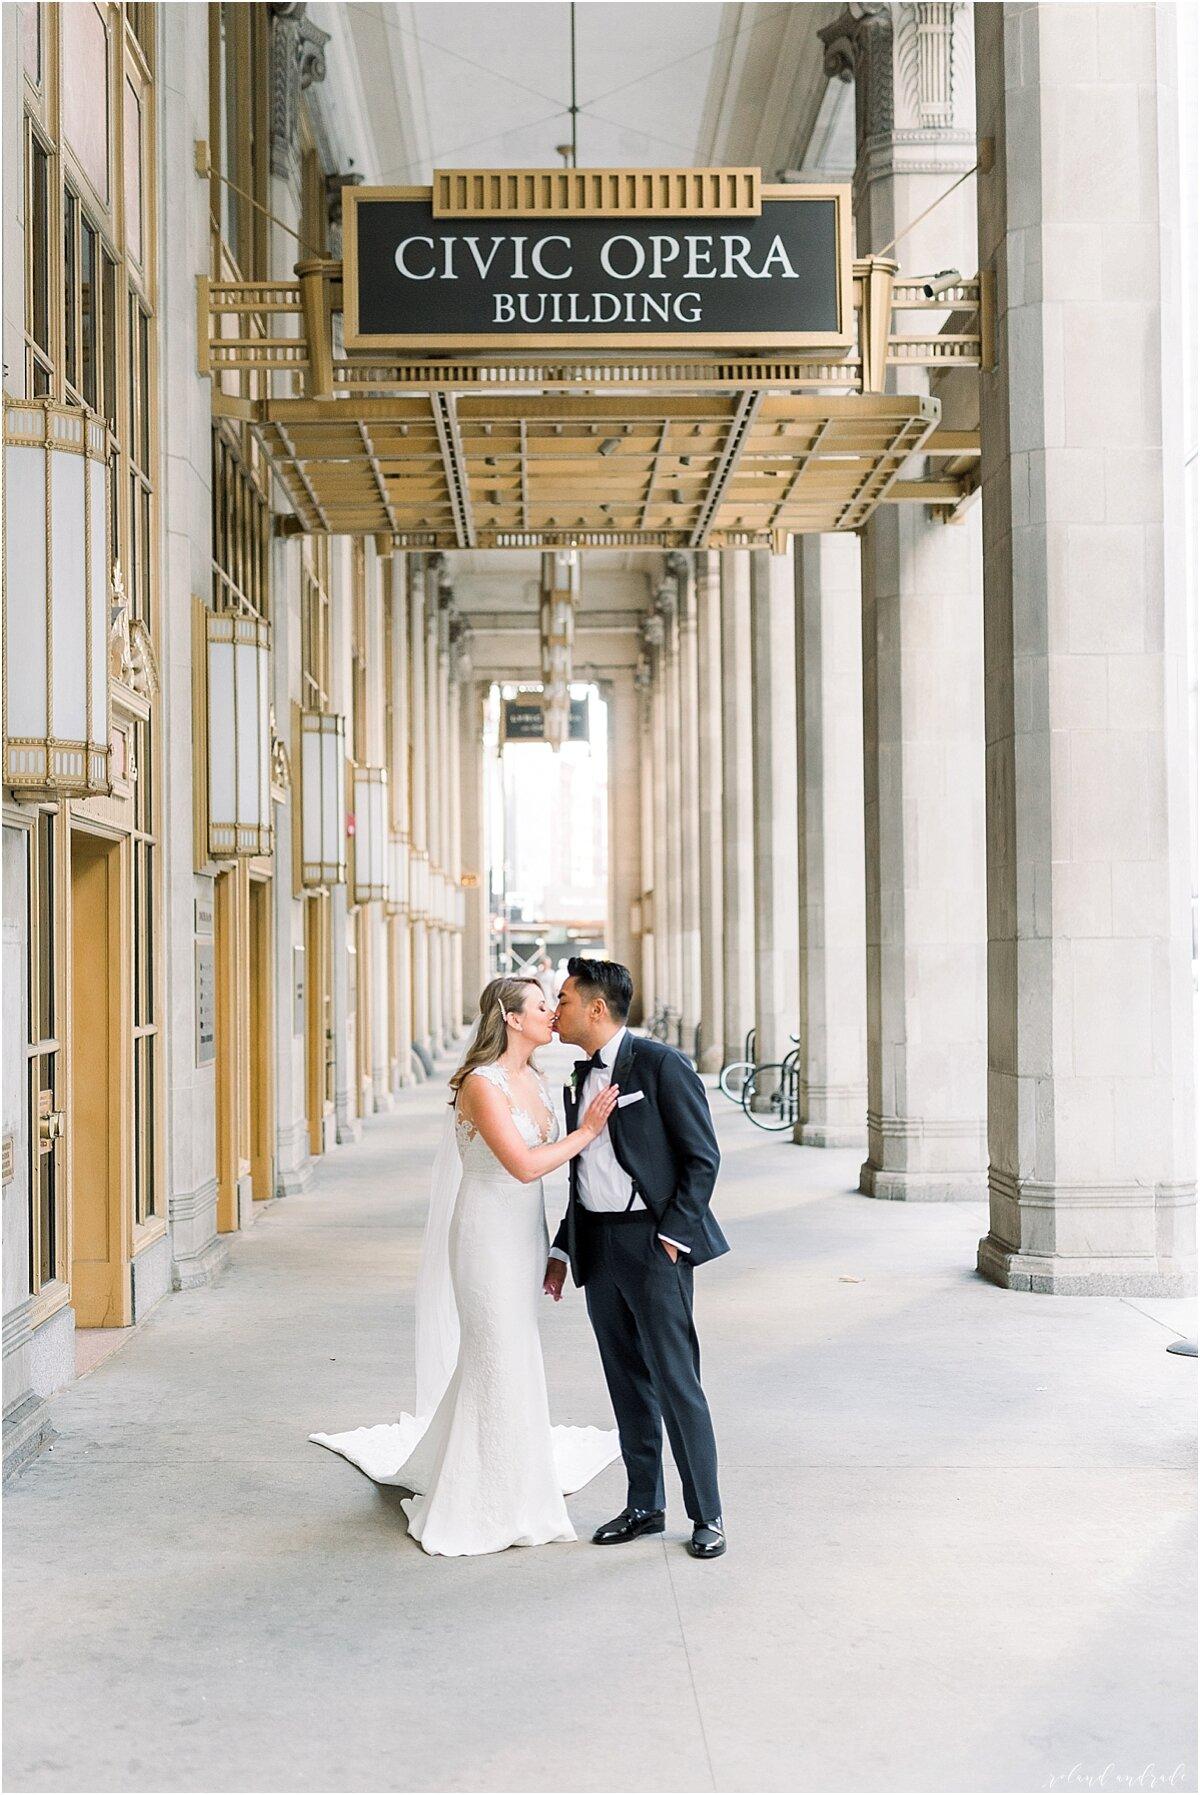 River Roast Wedding + Light and Airy Wedding Photographer Chicago + renaissance Hotel Wedding Photographer + Chicago Photography + Naperville Wedding Photographer + Chicago Engagement Photographer + Best Photographer In Chicago_0047.jpg